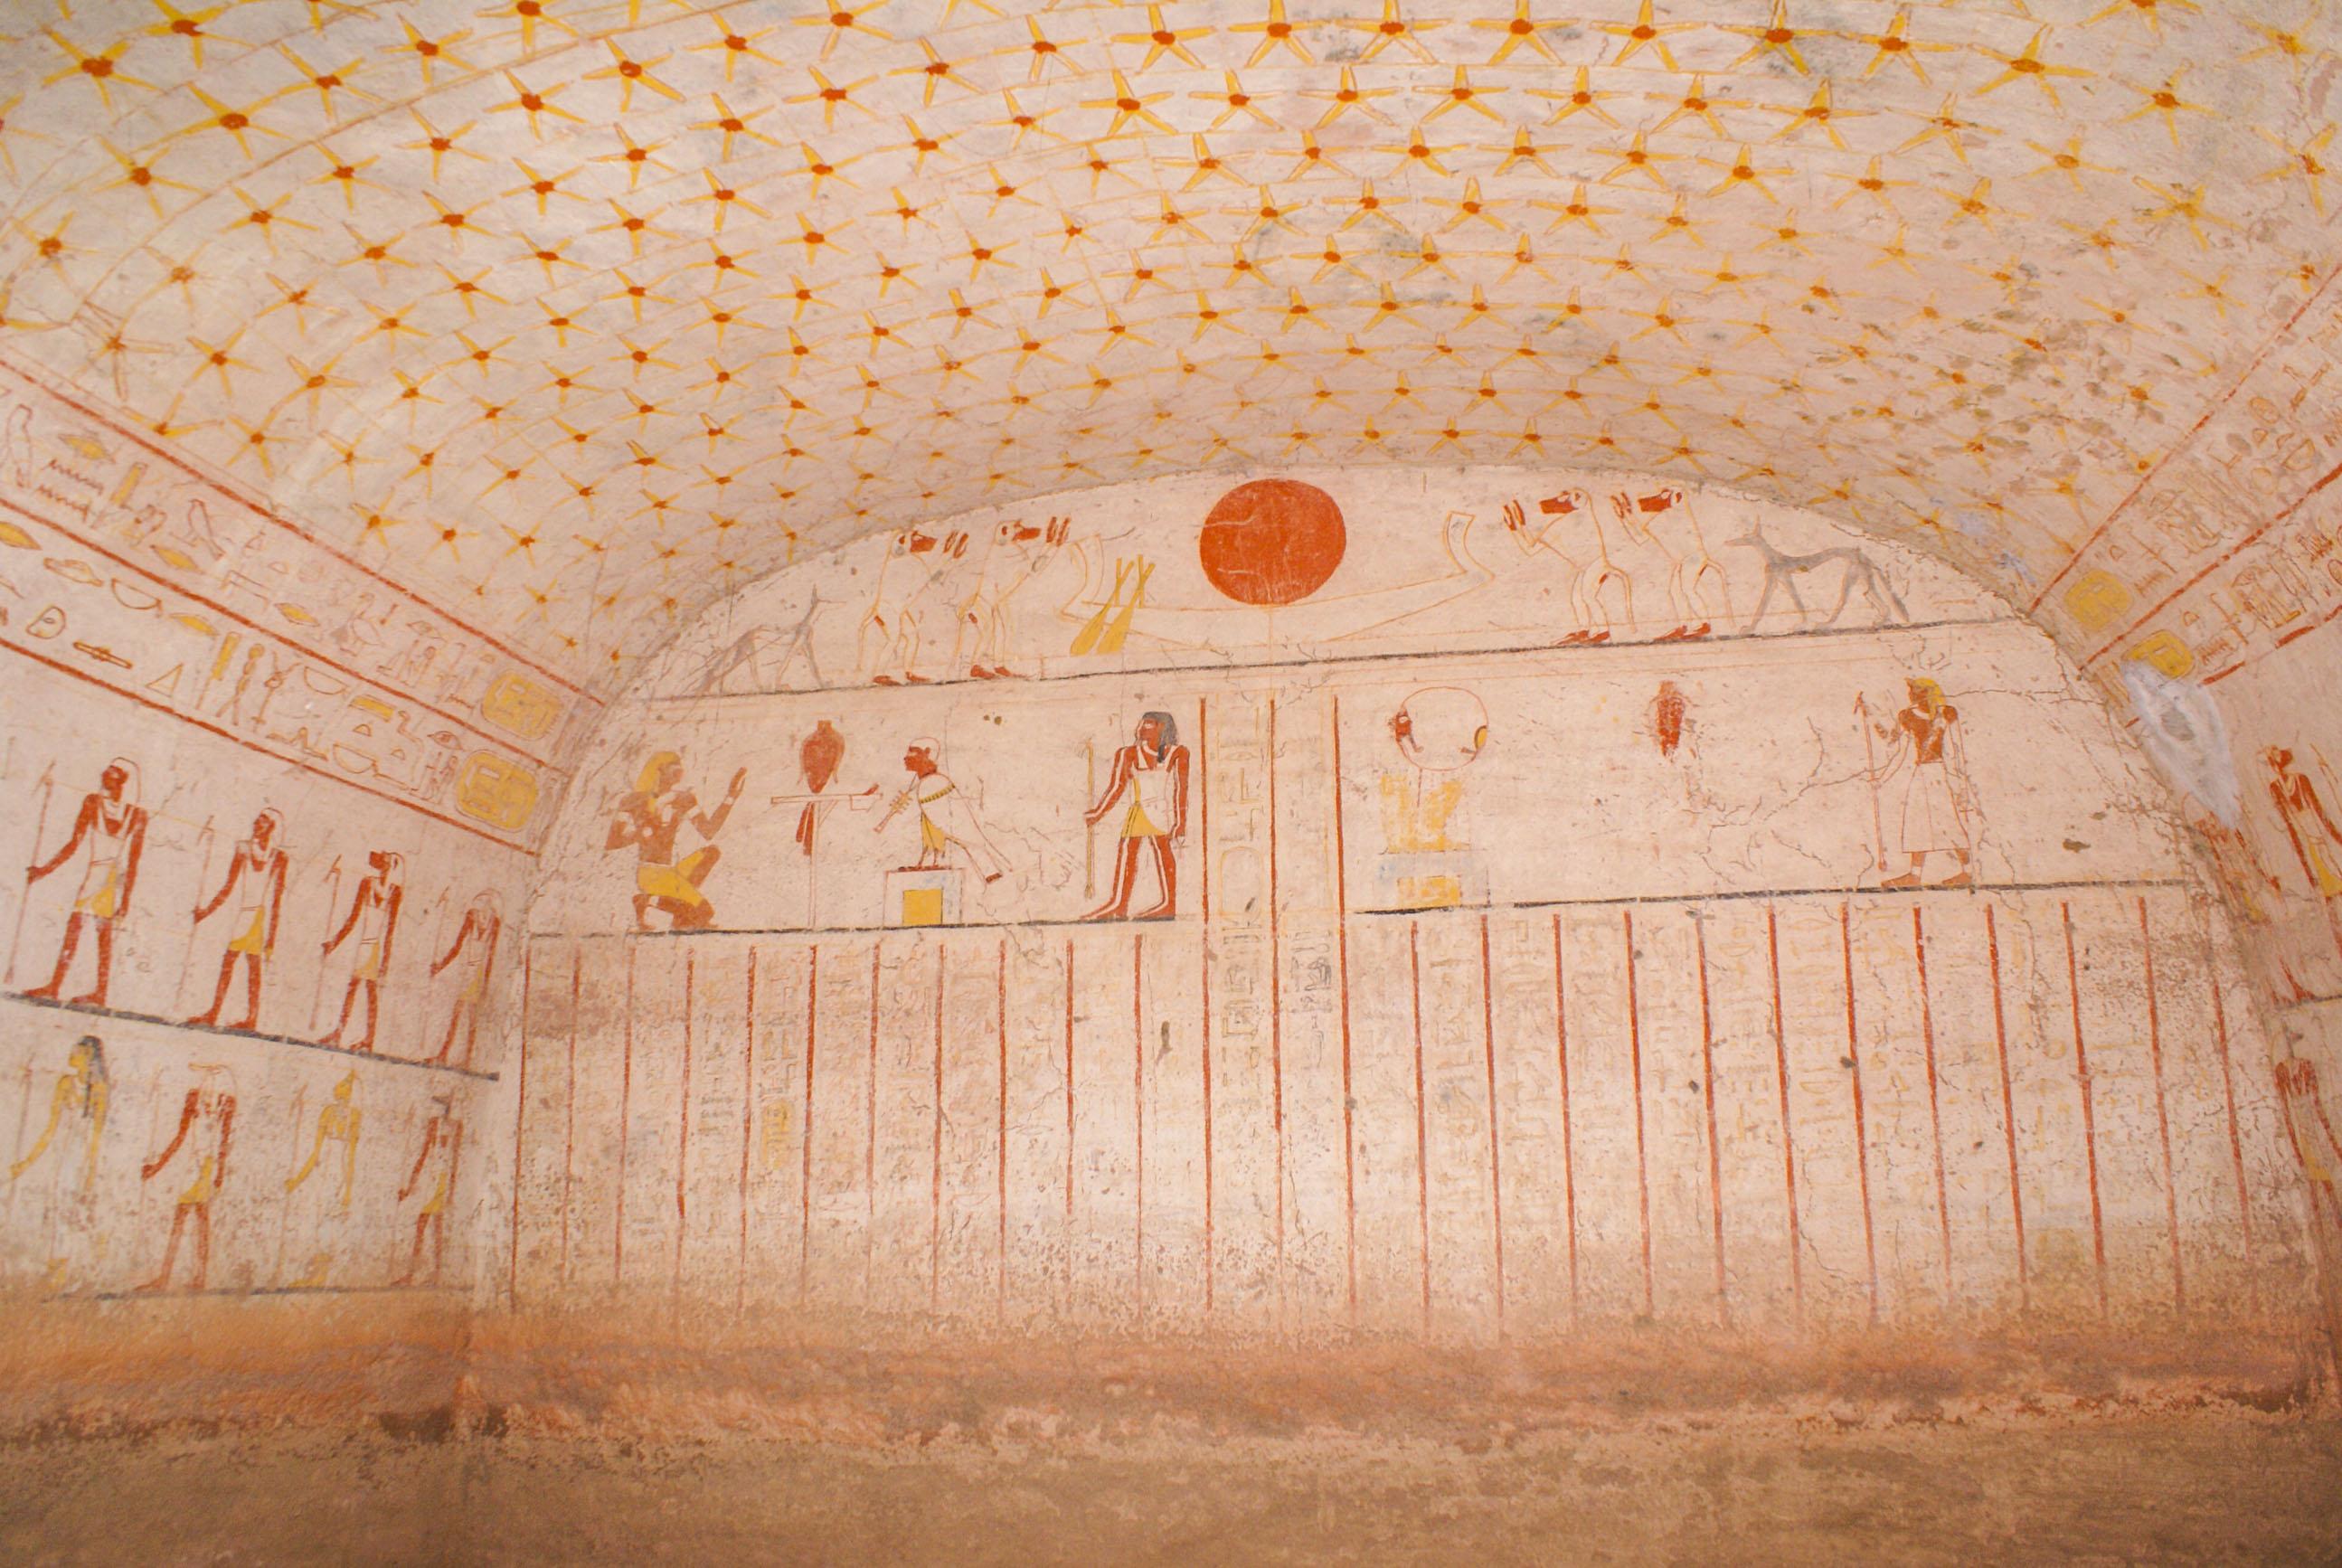 https://bubo.sk/uploads/galleries/17820/lubosfellner_sudan_6a-vnutro-pyramidy-a-ziadni-ini-turisti.jpg